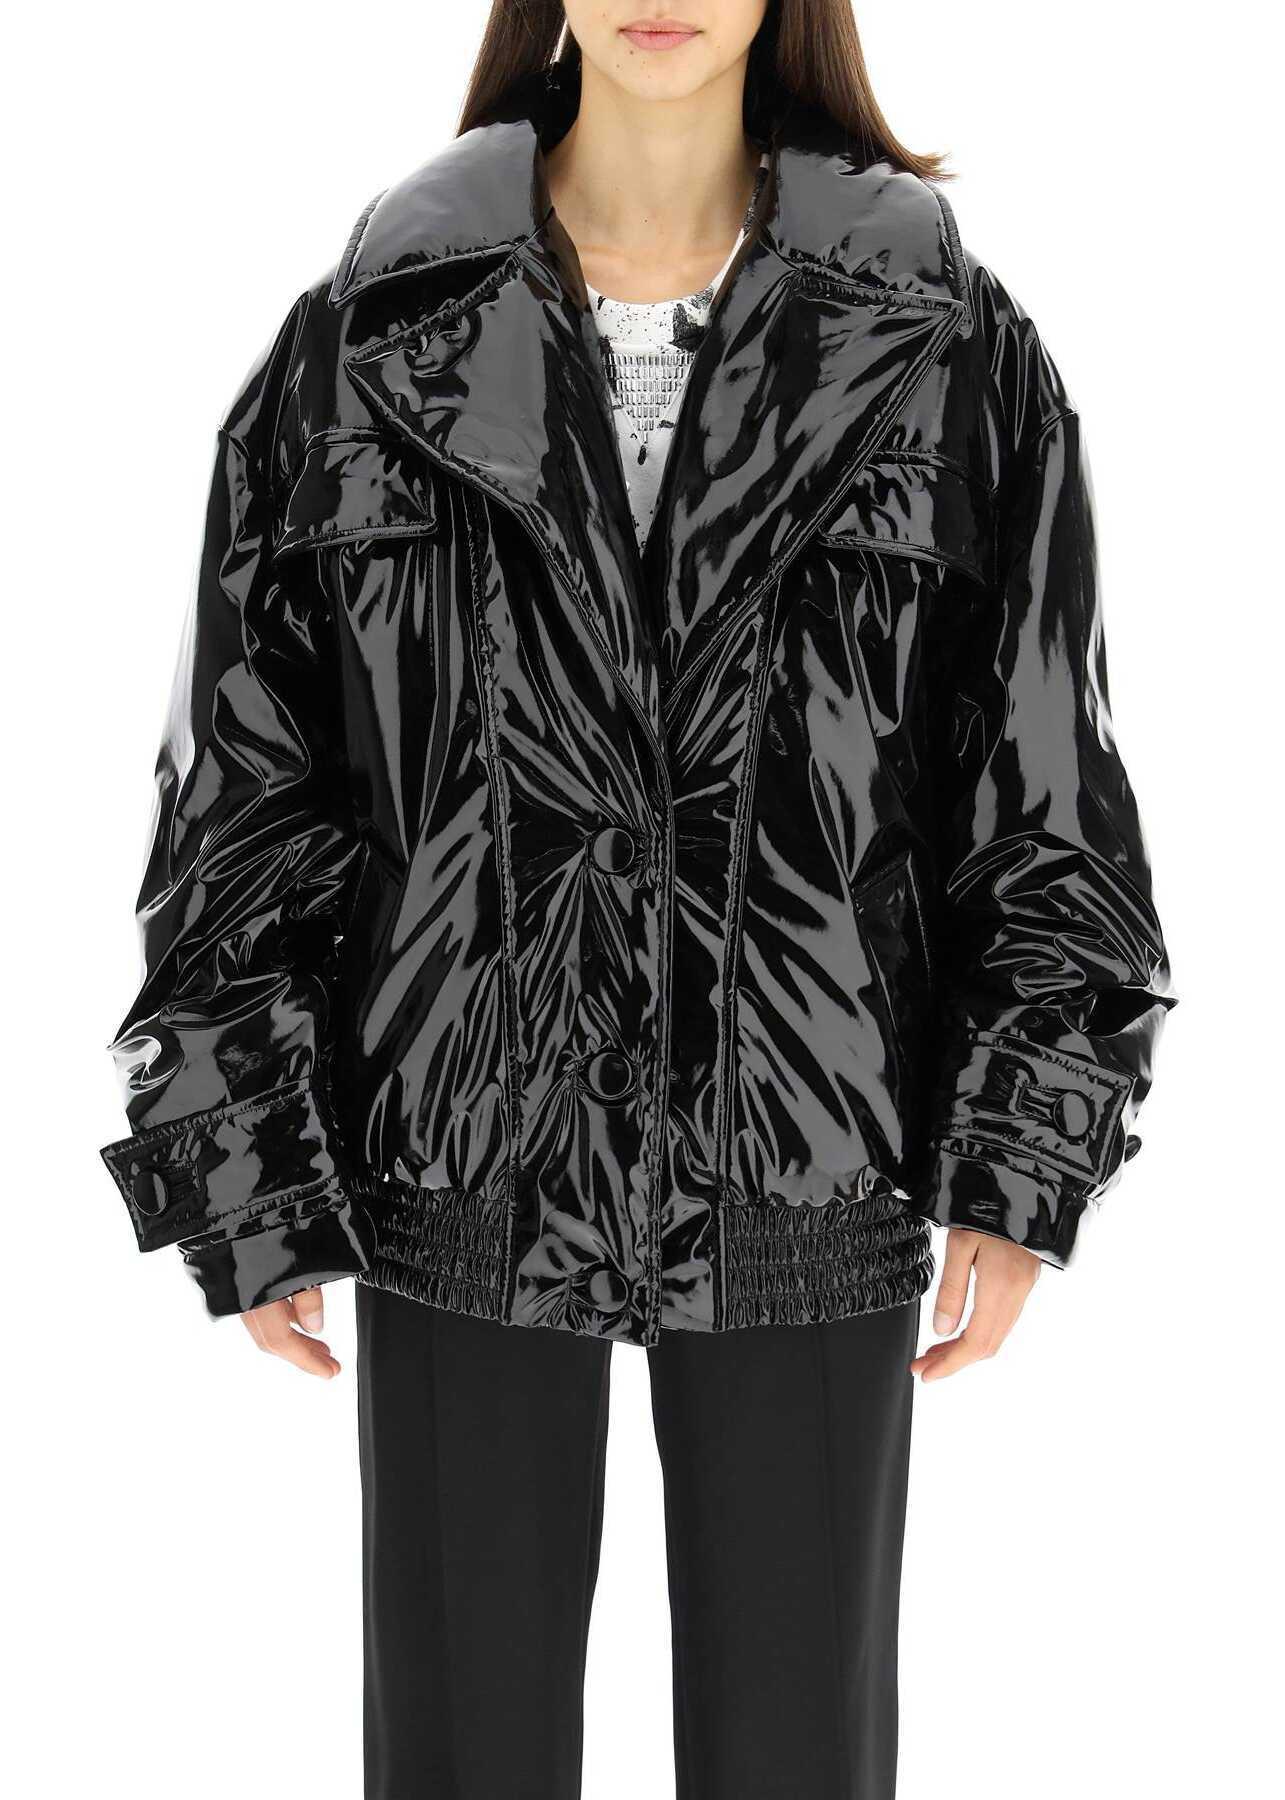 Dolce & Gabbana Patent Leather Jacket F9K07T FUSJQ NERO image0